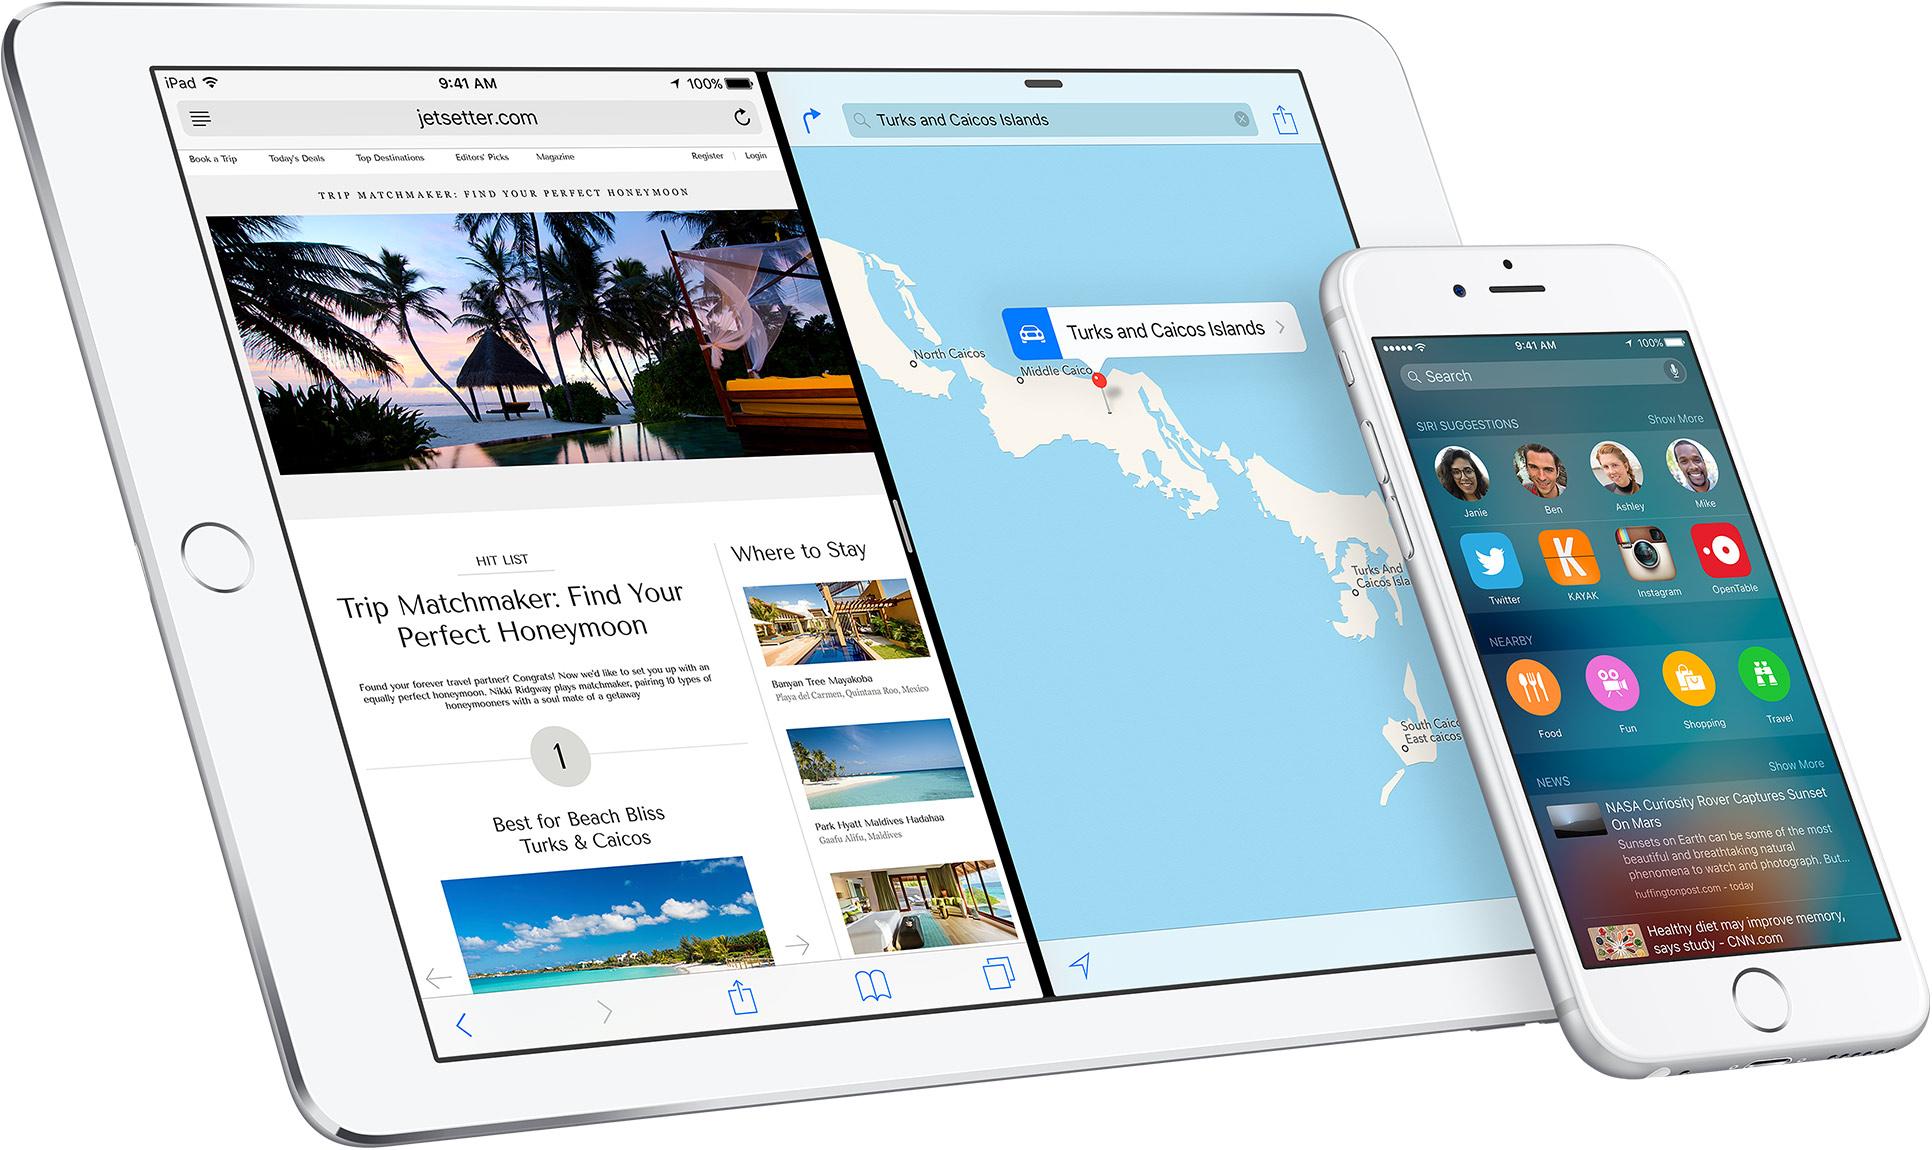 iPad Air, iPhone 6